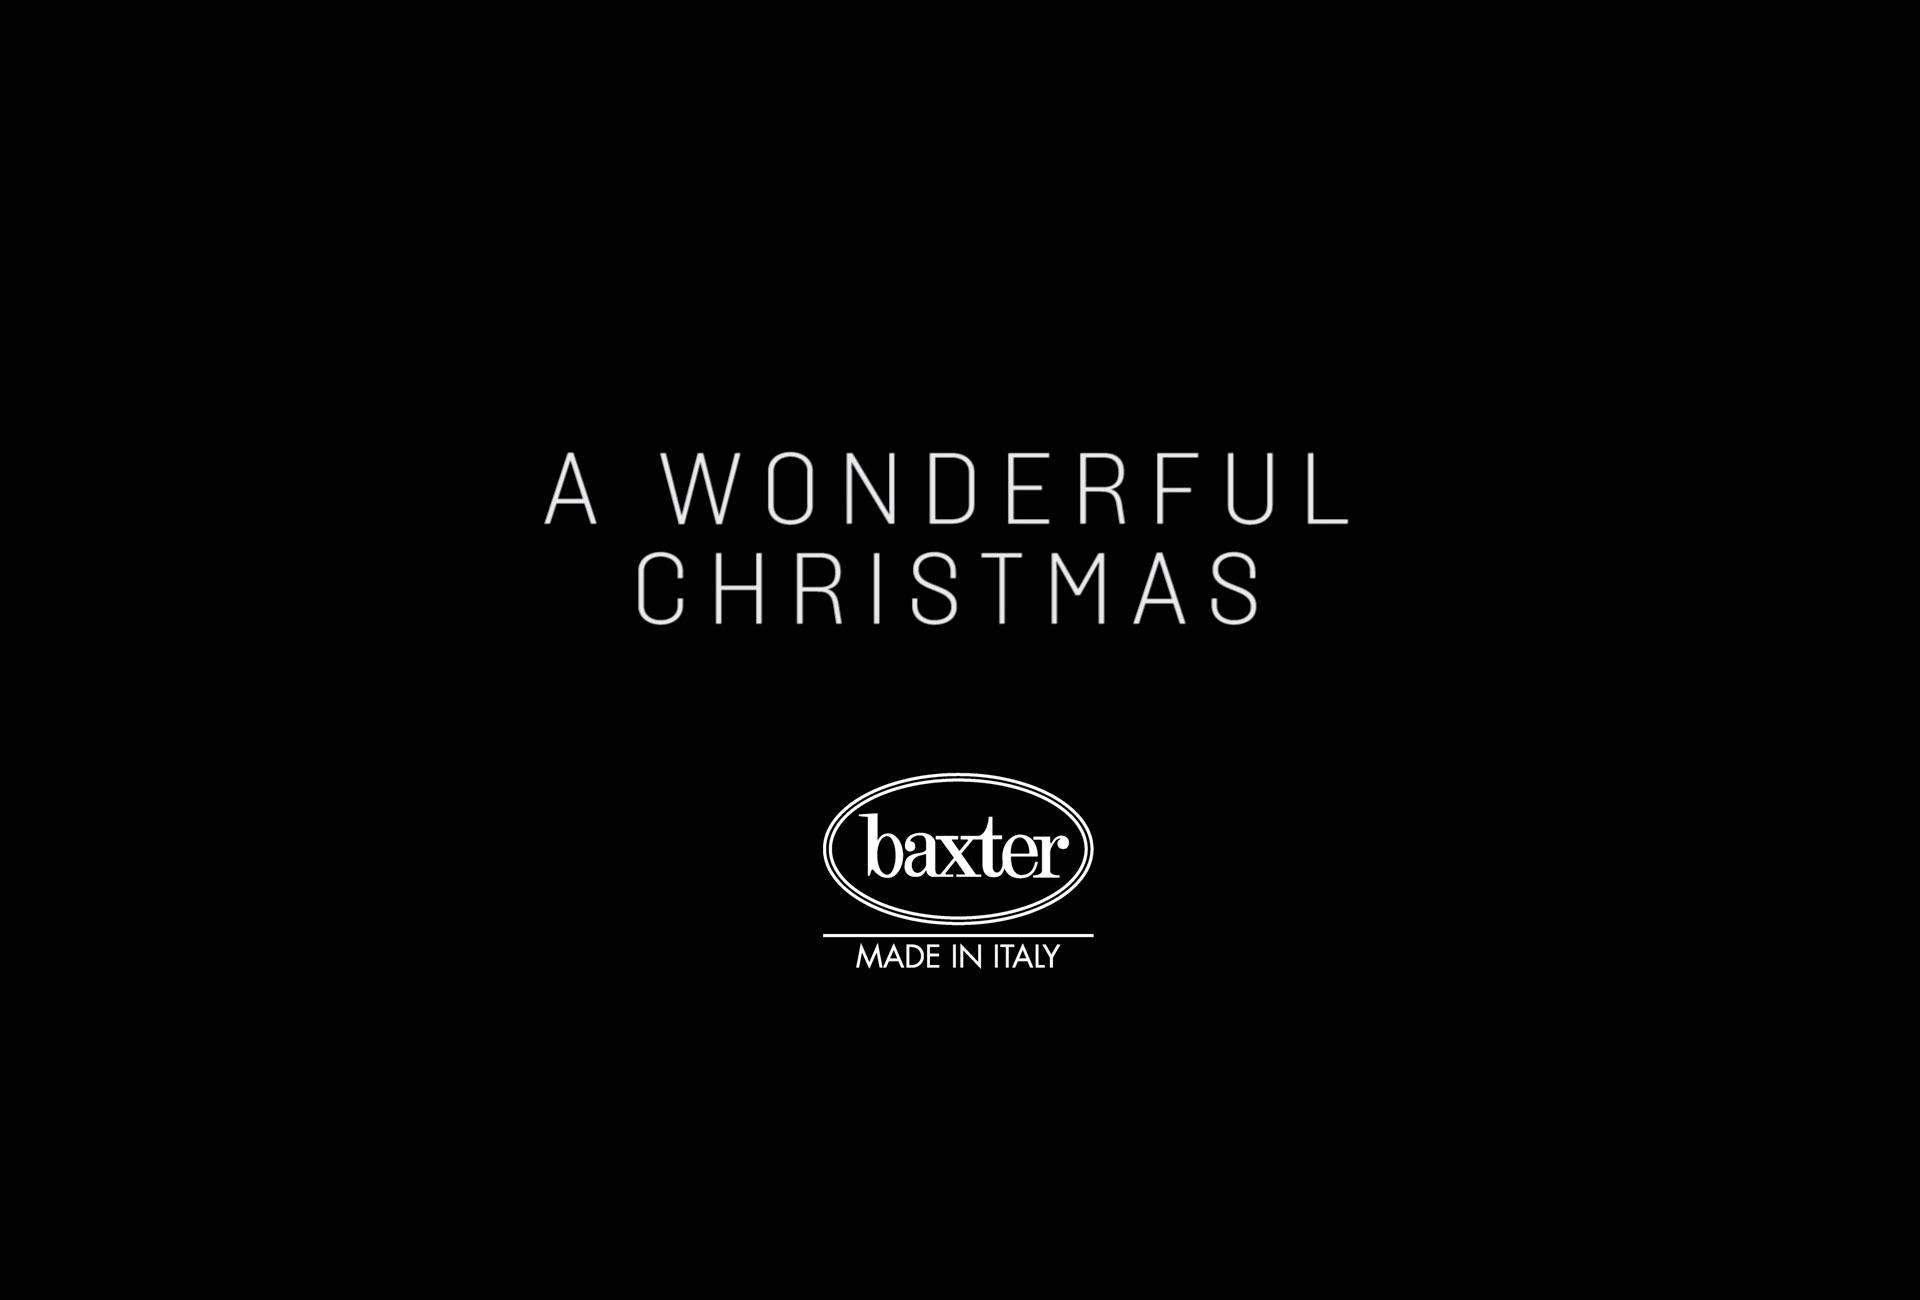 A WONDERFUL CHRISTMAS - BAXTER 2019